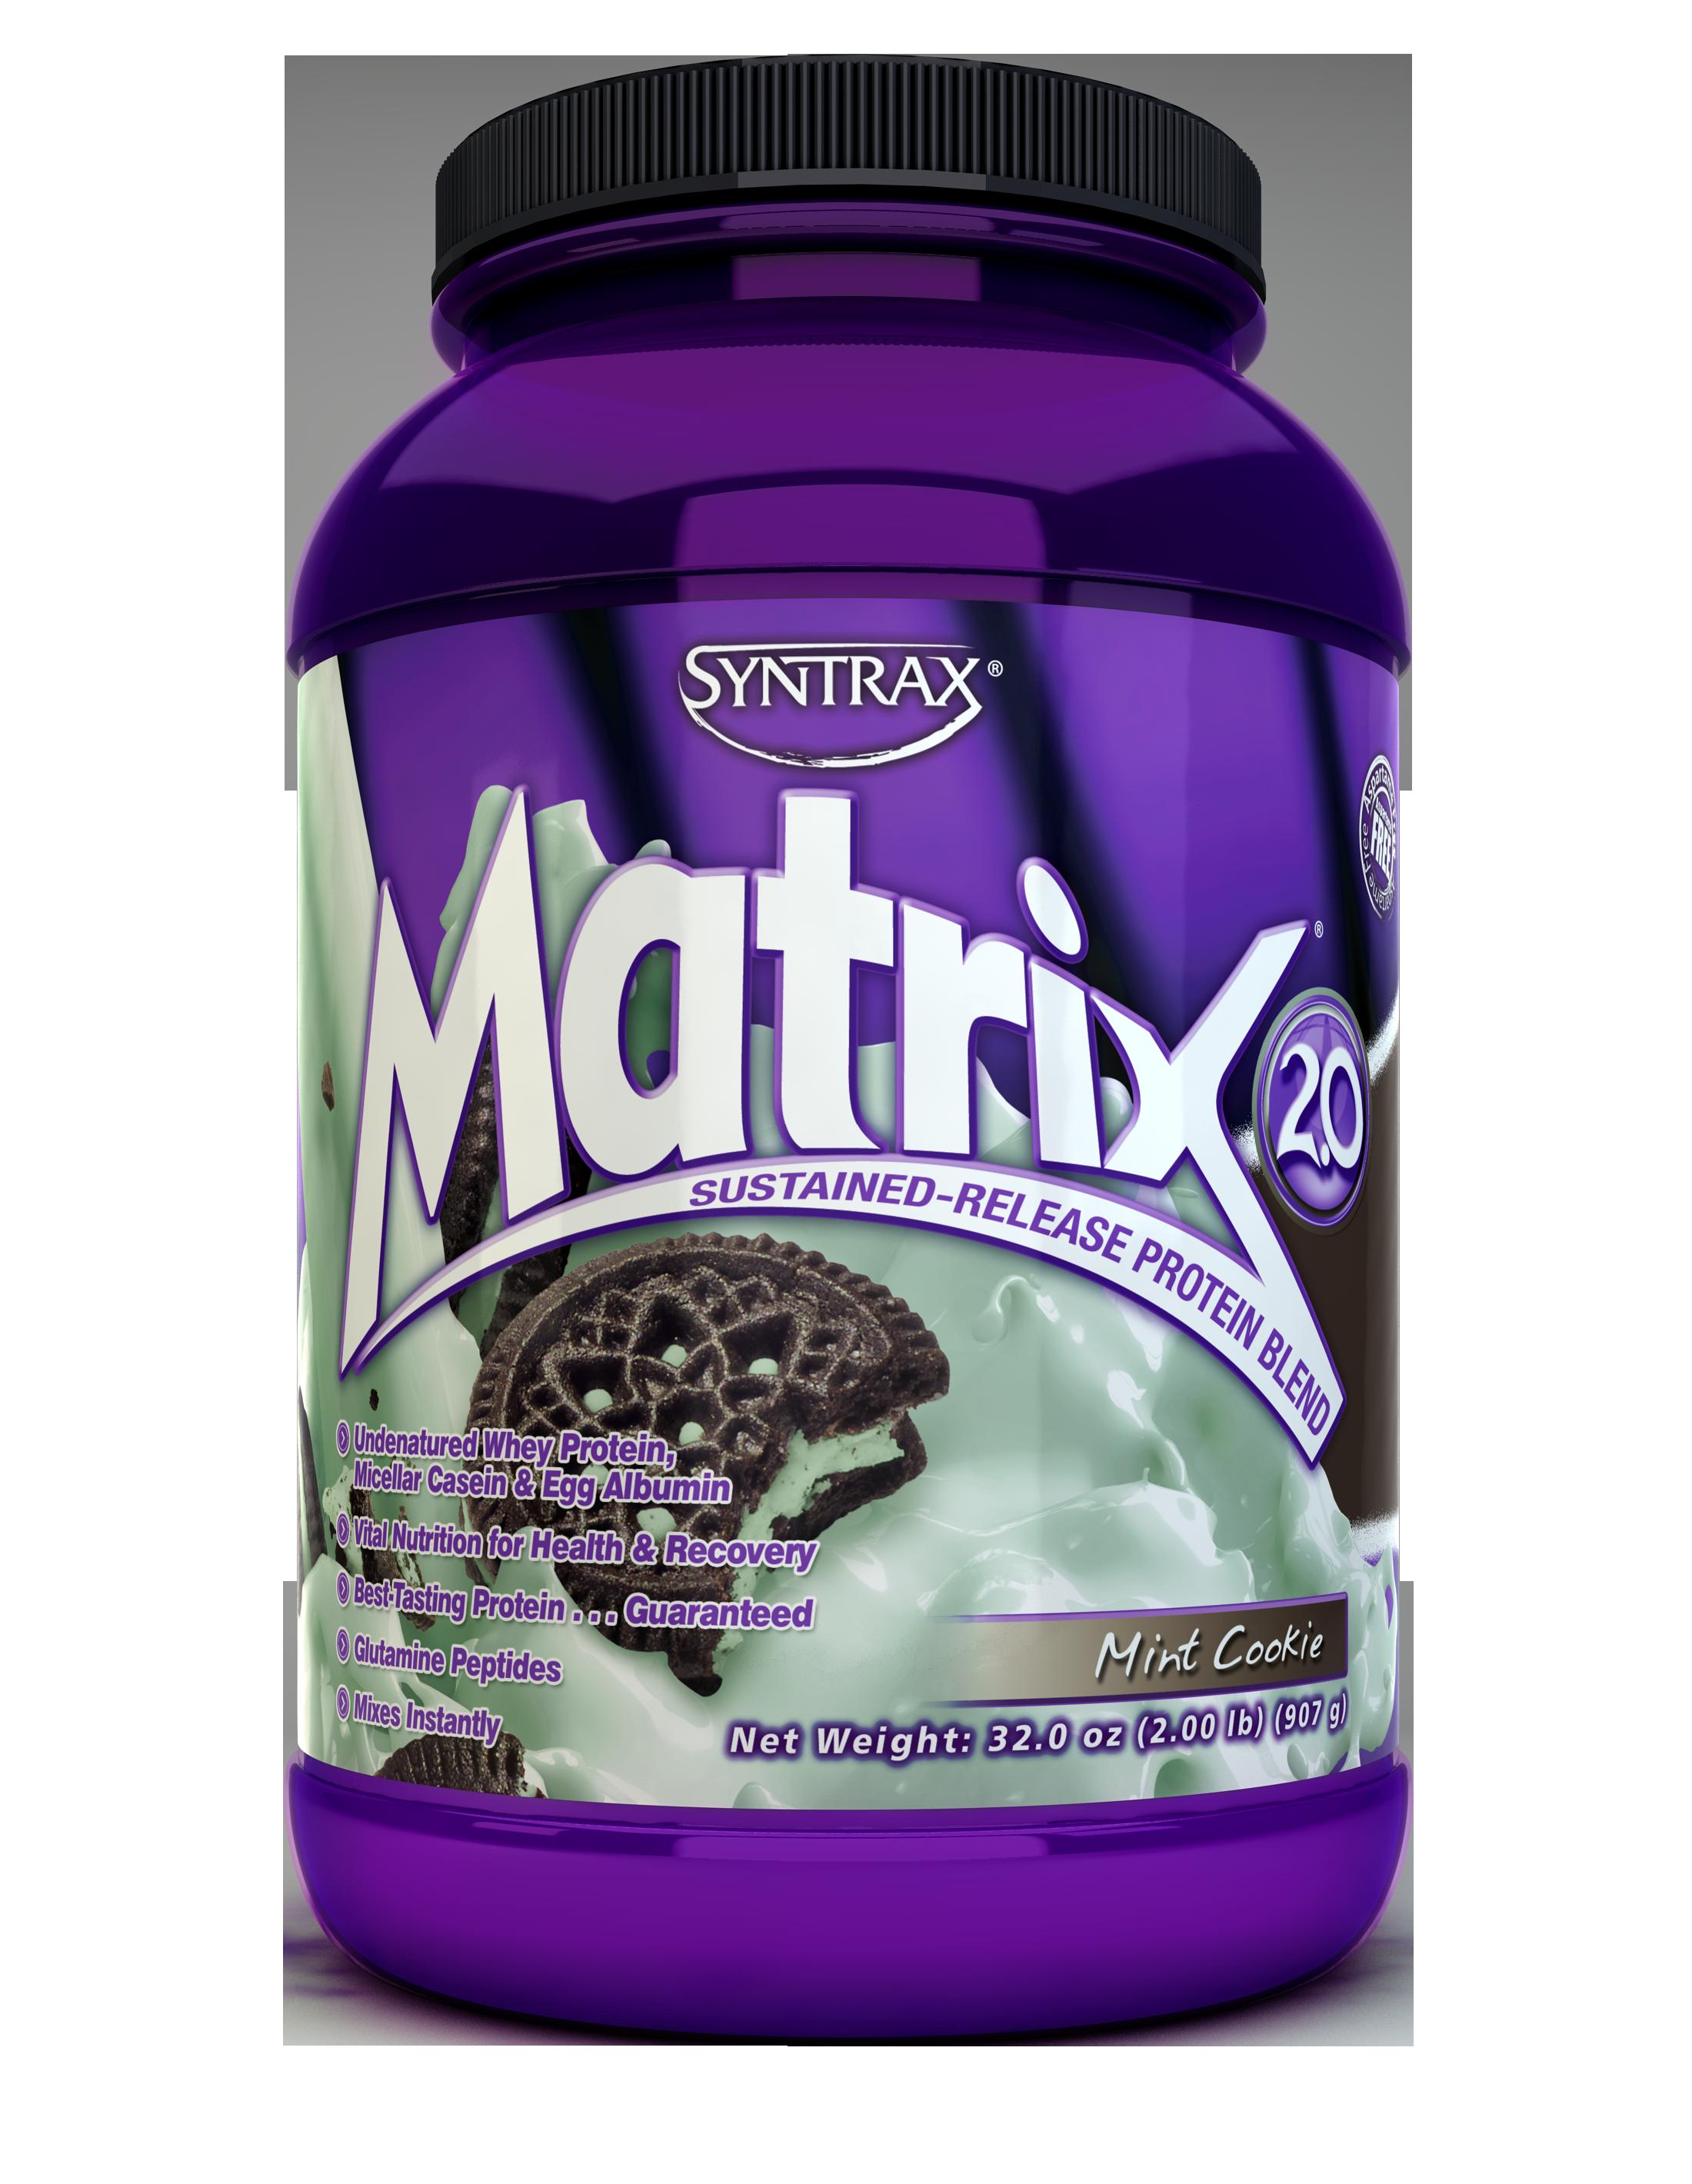 Syntrax Matrix 2.0 - Mint Cookie 2 lb